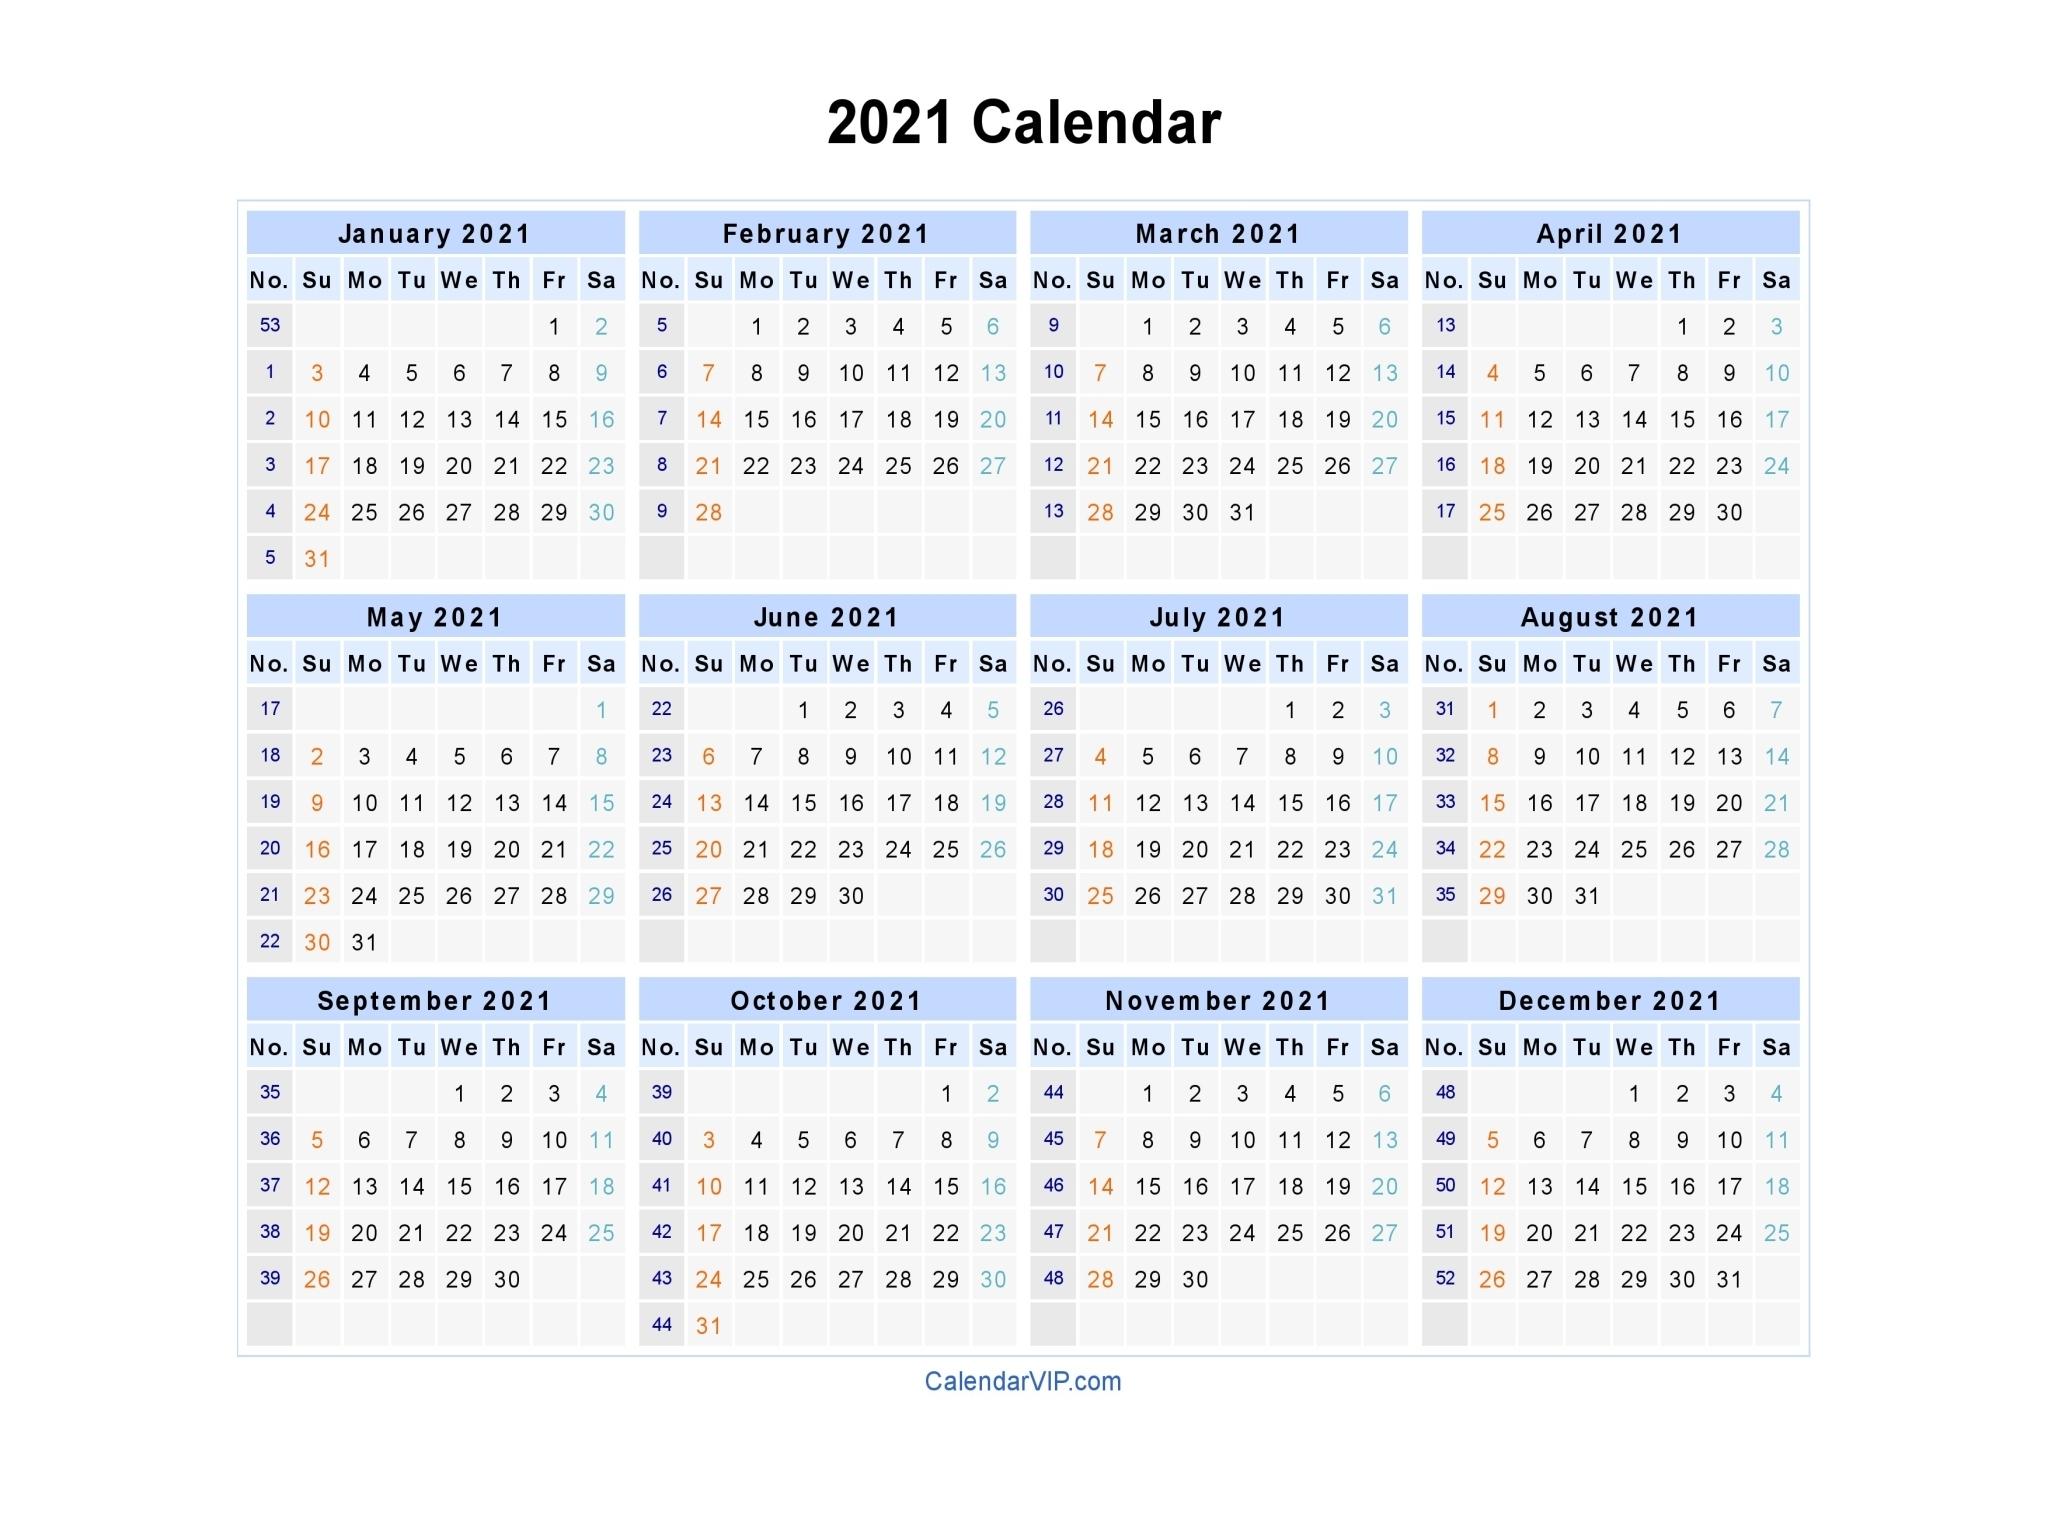 Collect 2021 Excel Calendar Weeks